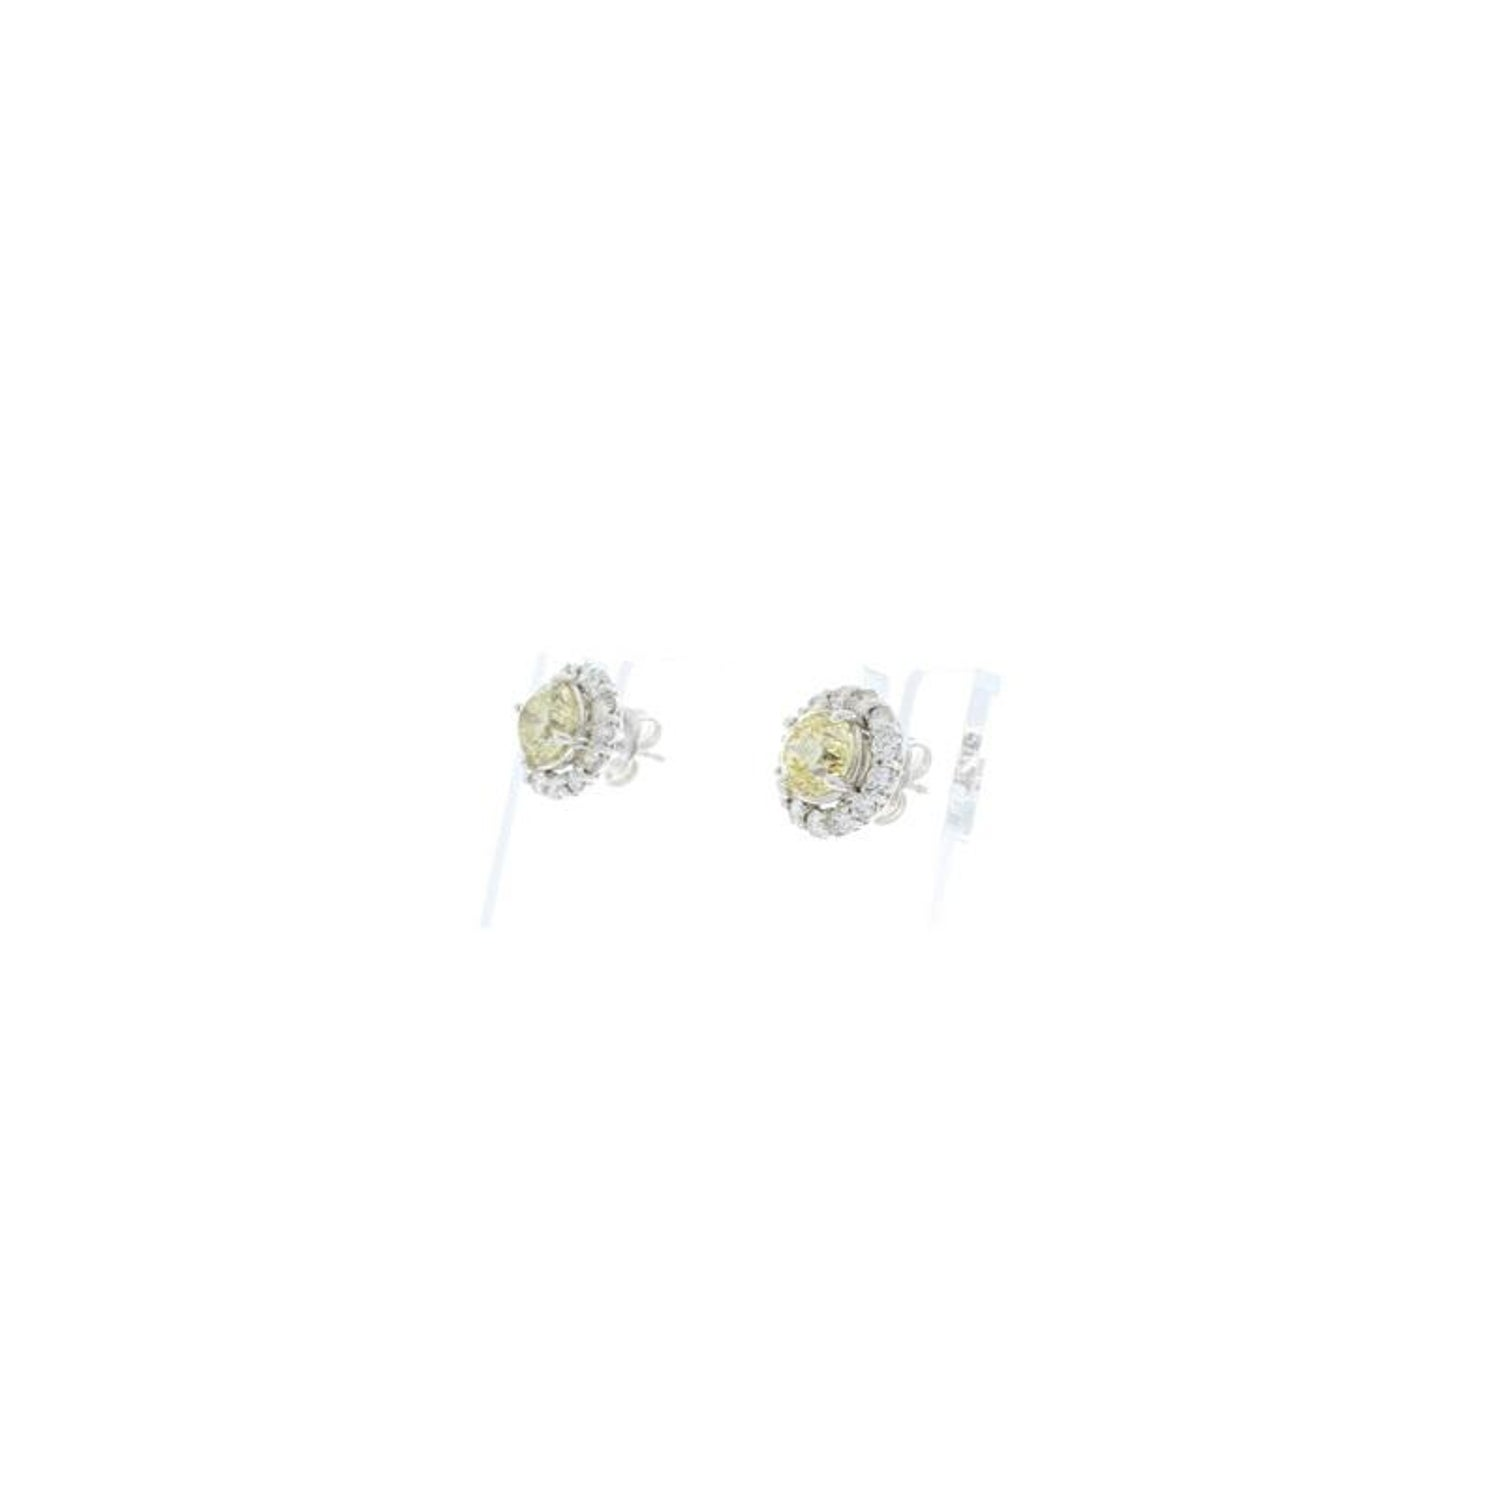 1757f7b6e3e 2.06 Carat Total Yellow Diamonds Earrings with EGL USA Certified Diamond  Halo For Sale at 1stdibs